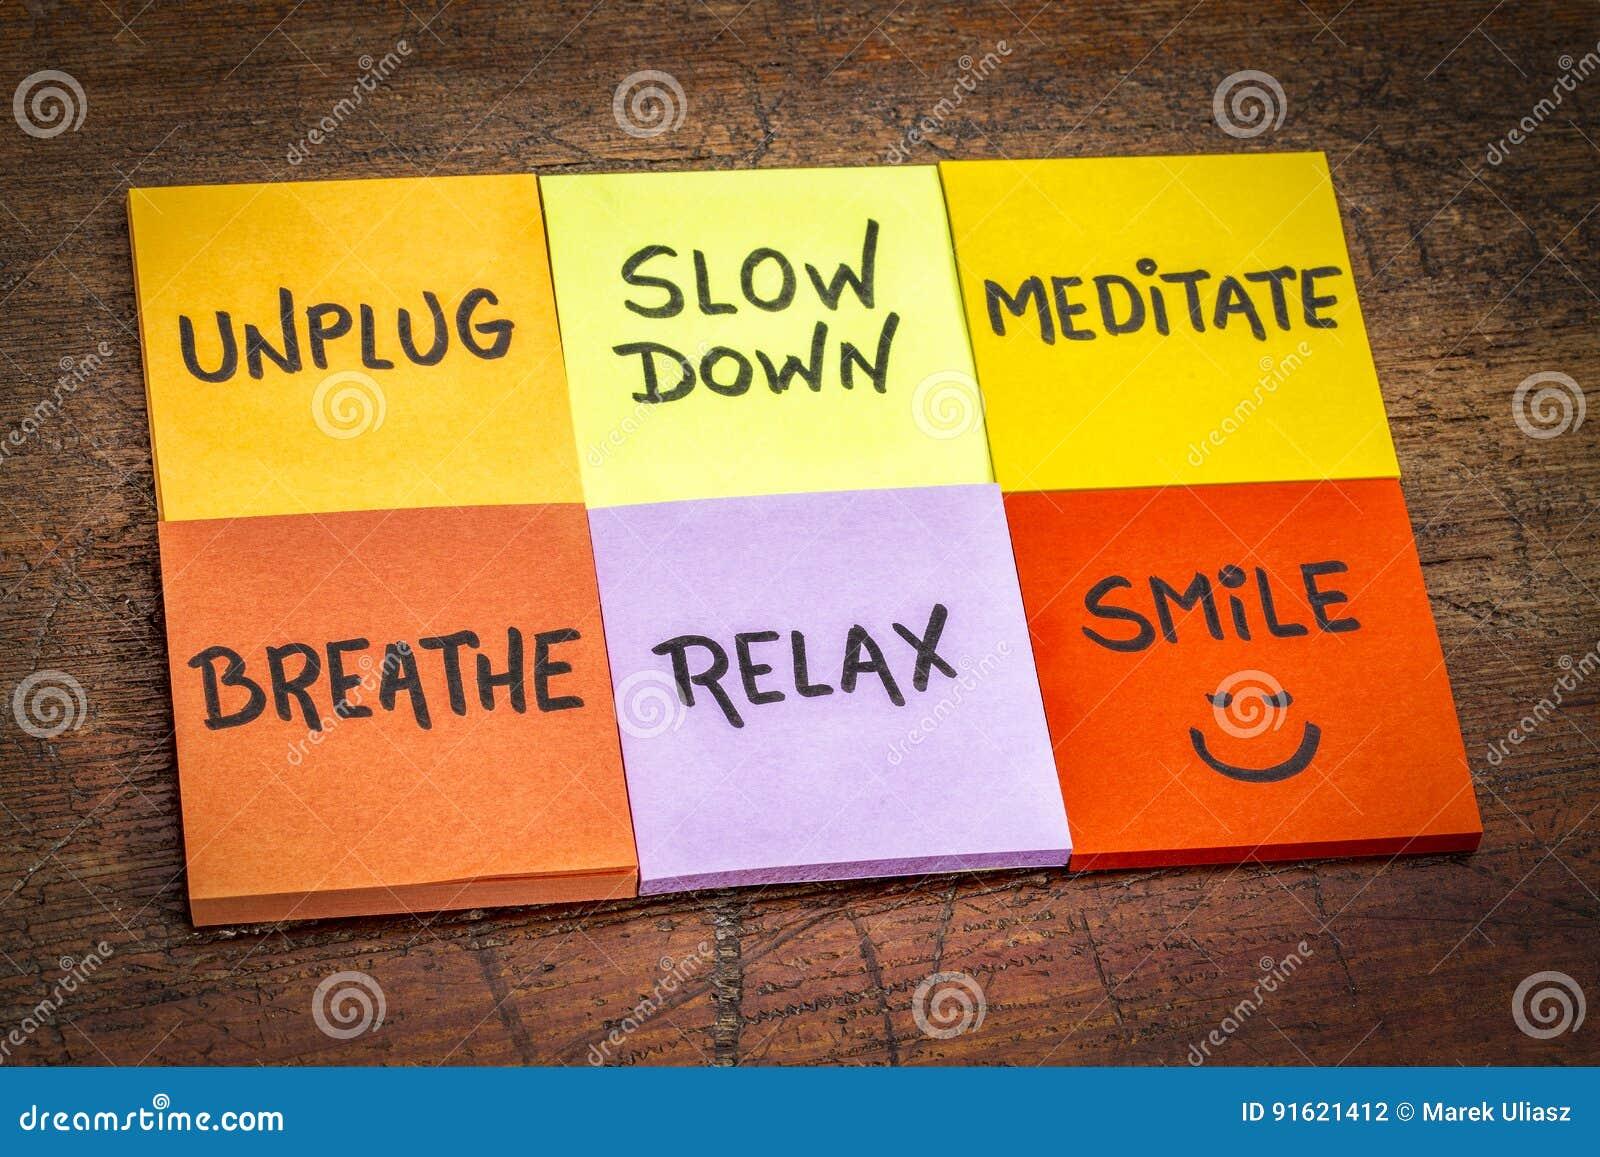 Unplug, slow down, meditate, breathe, relax, smile concept